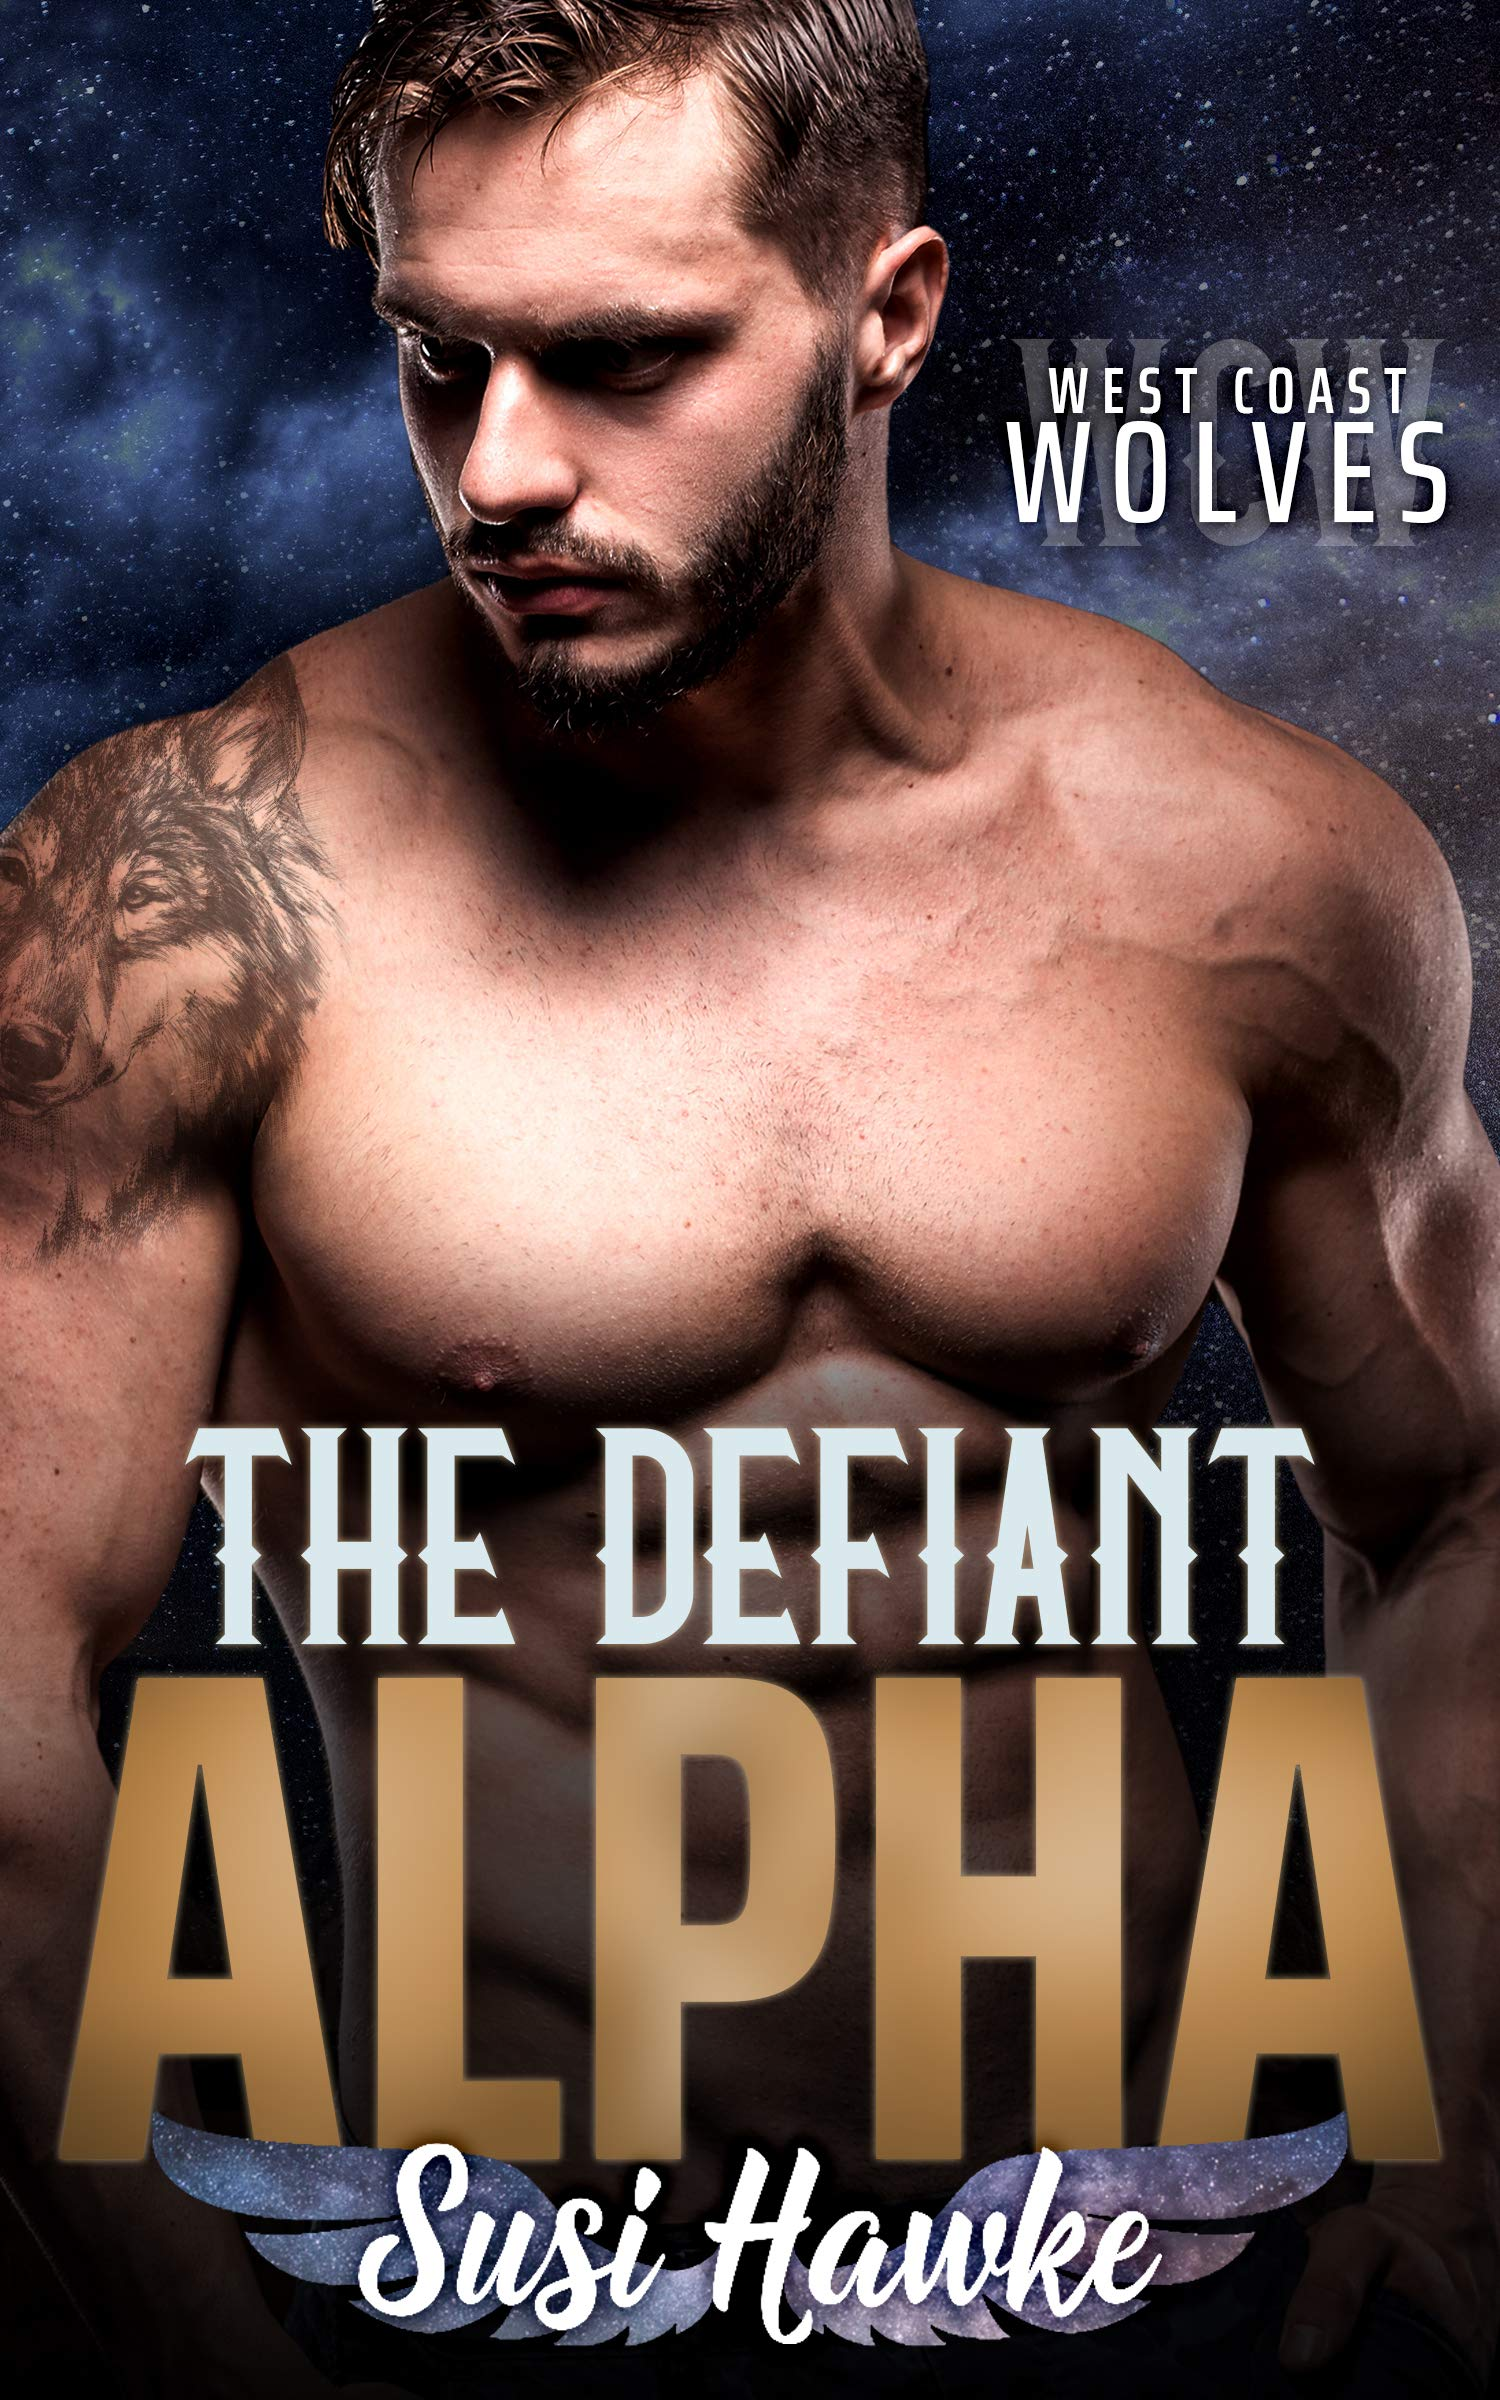 The Defiant Alpha (West Coast Wolves, #2)